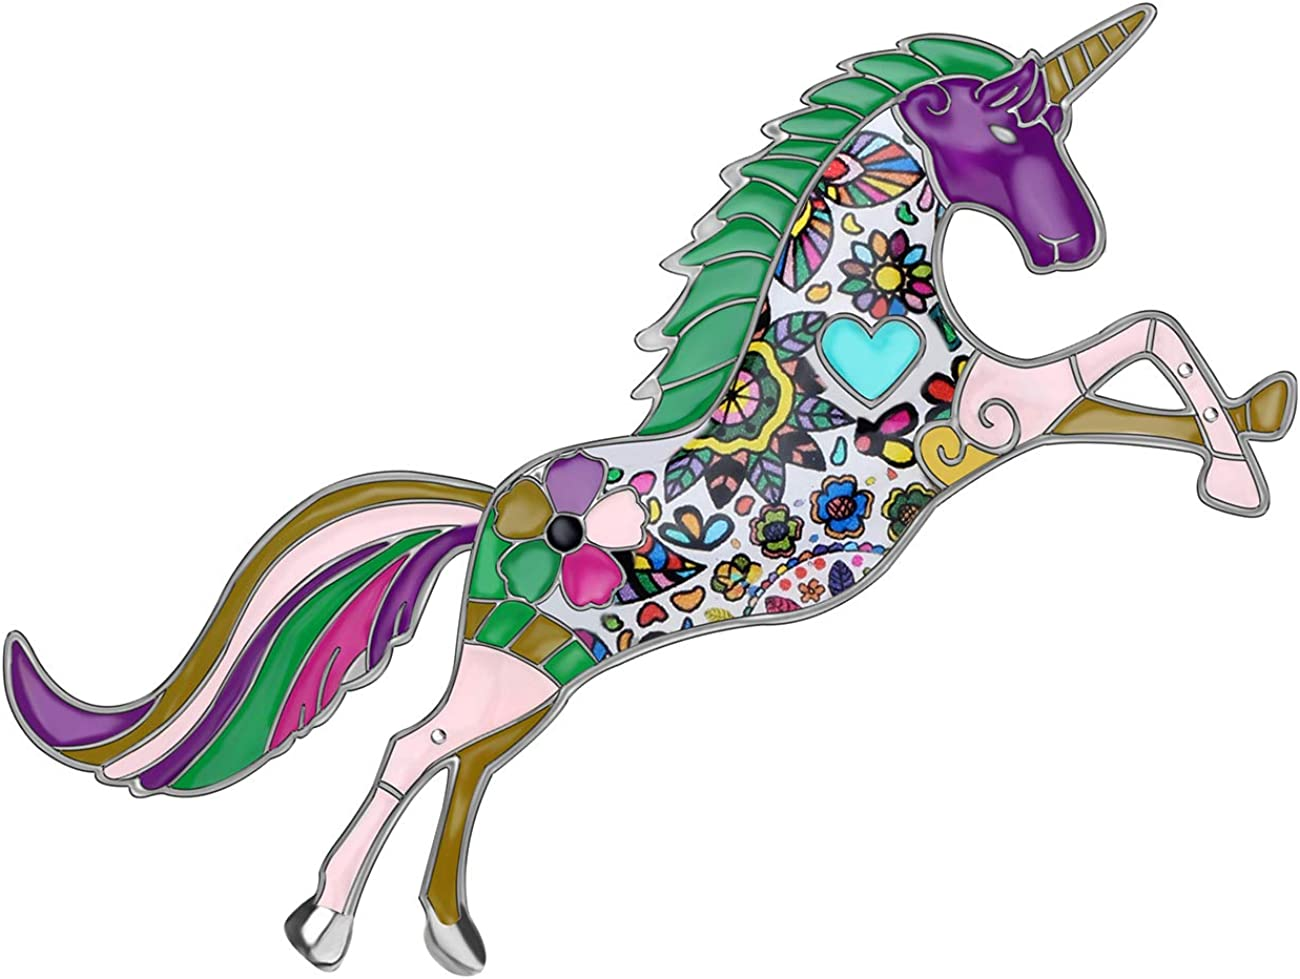 Max 51% OFF WEVENI Enamel Alloy Unicorn Brooch Detroit Mall Dress Pin Horse Jewelry Suit